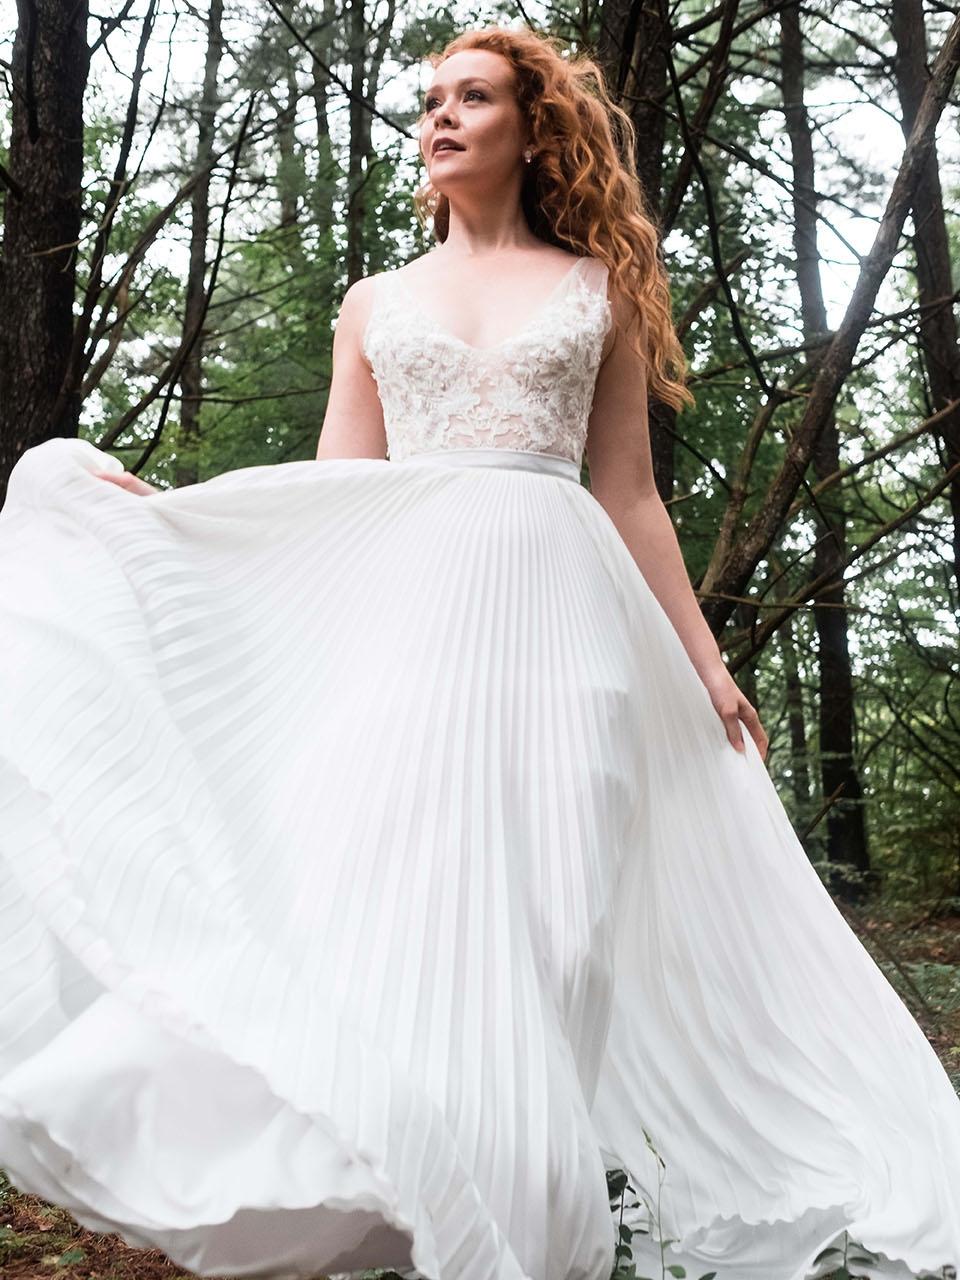 rebecca_schoneveld_quinn_gown_applique_bodice_pleated_skirt_romantic_4.jpg